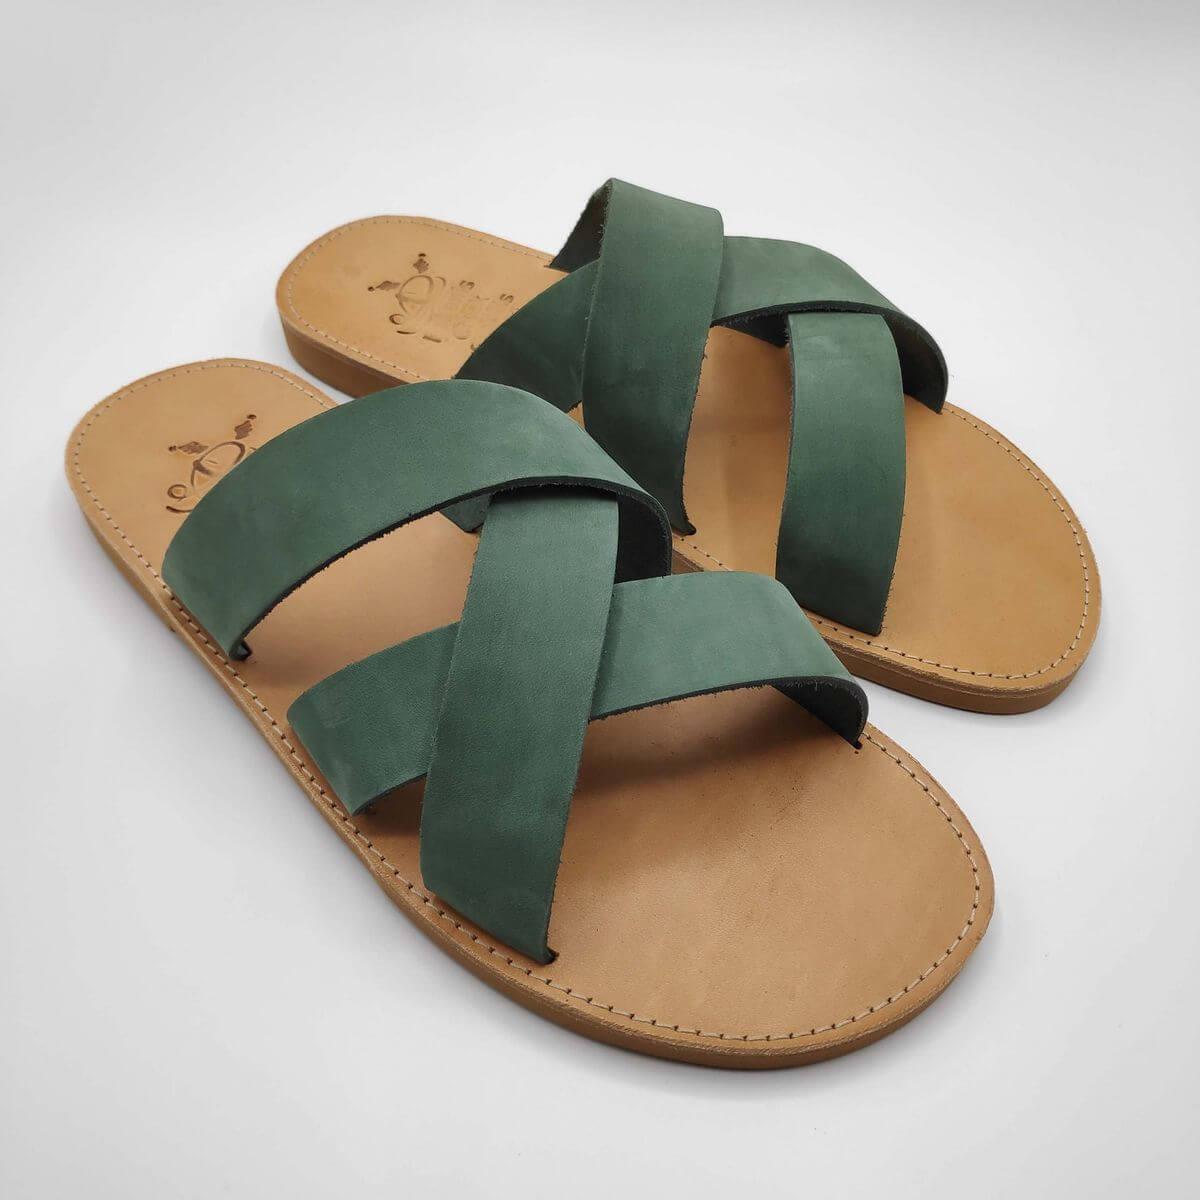 leather sandals for men green three straps criss cross side view - Avithos Men